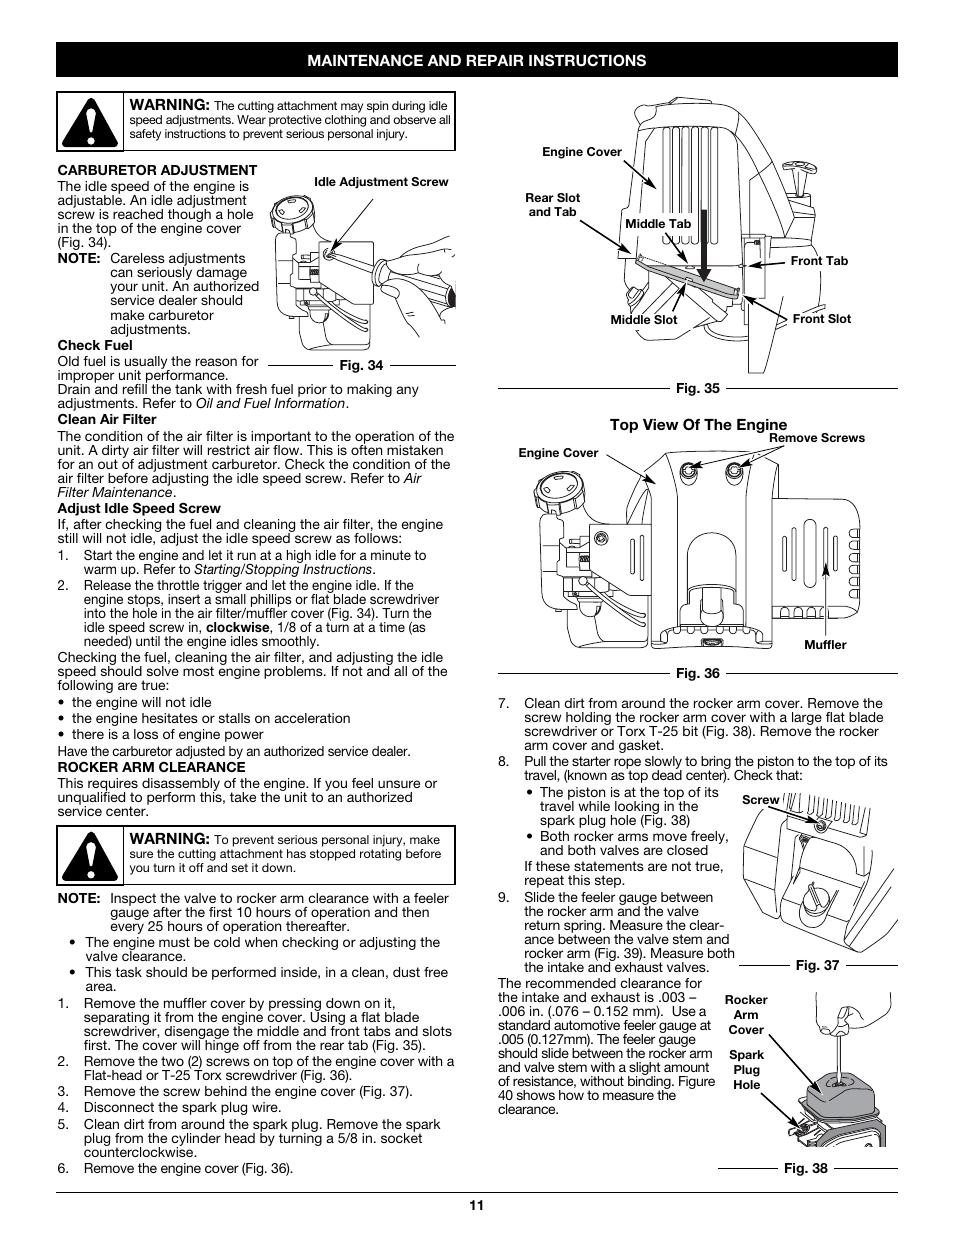 Troy Bilt Bronco Manual